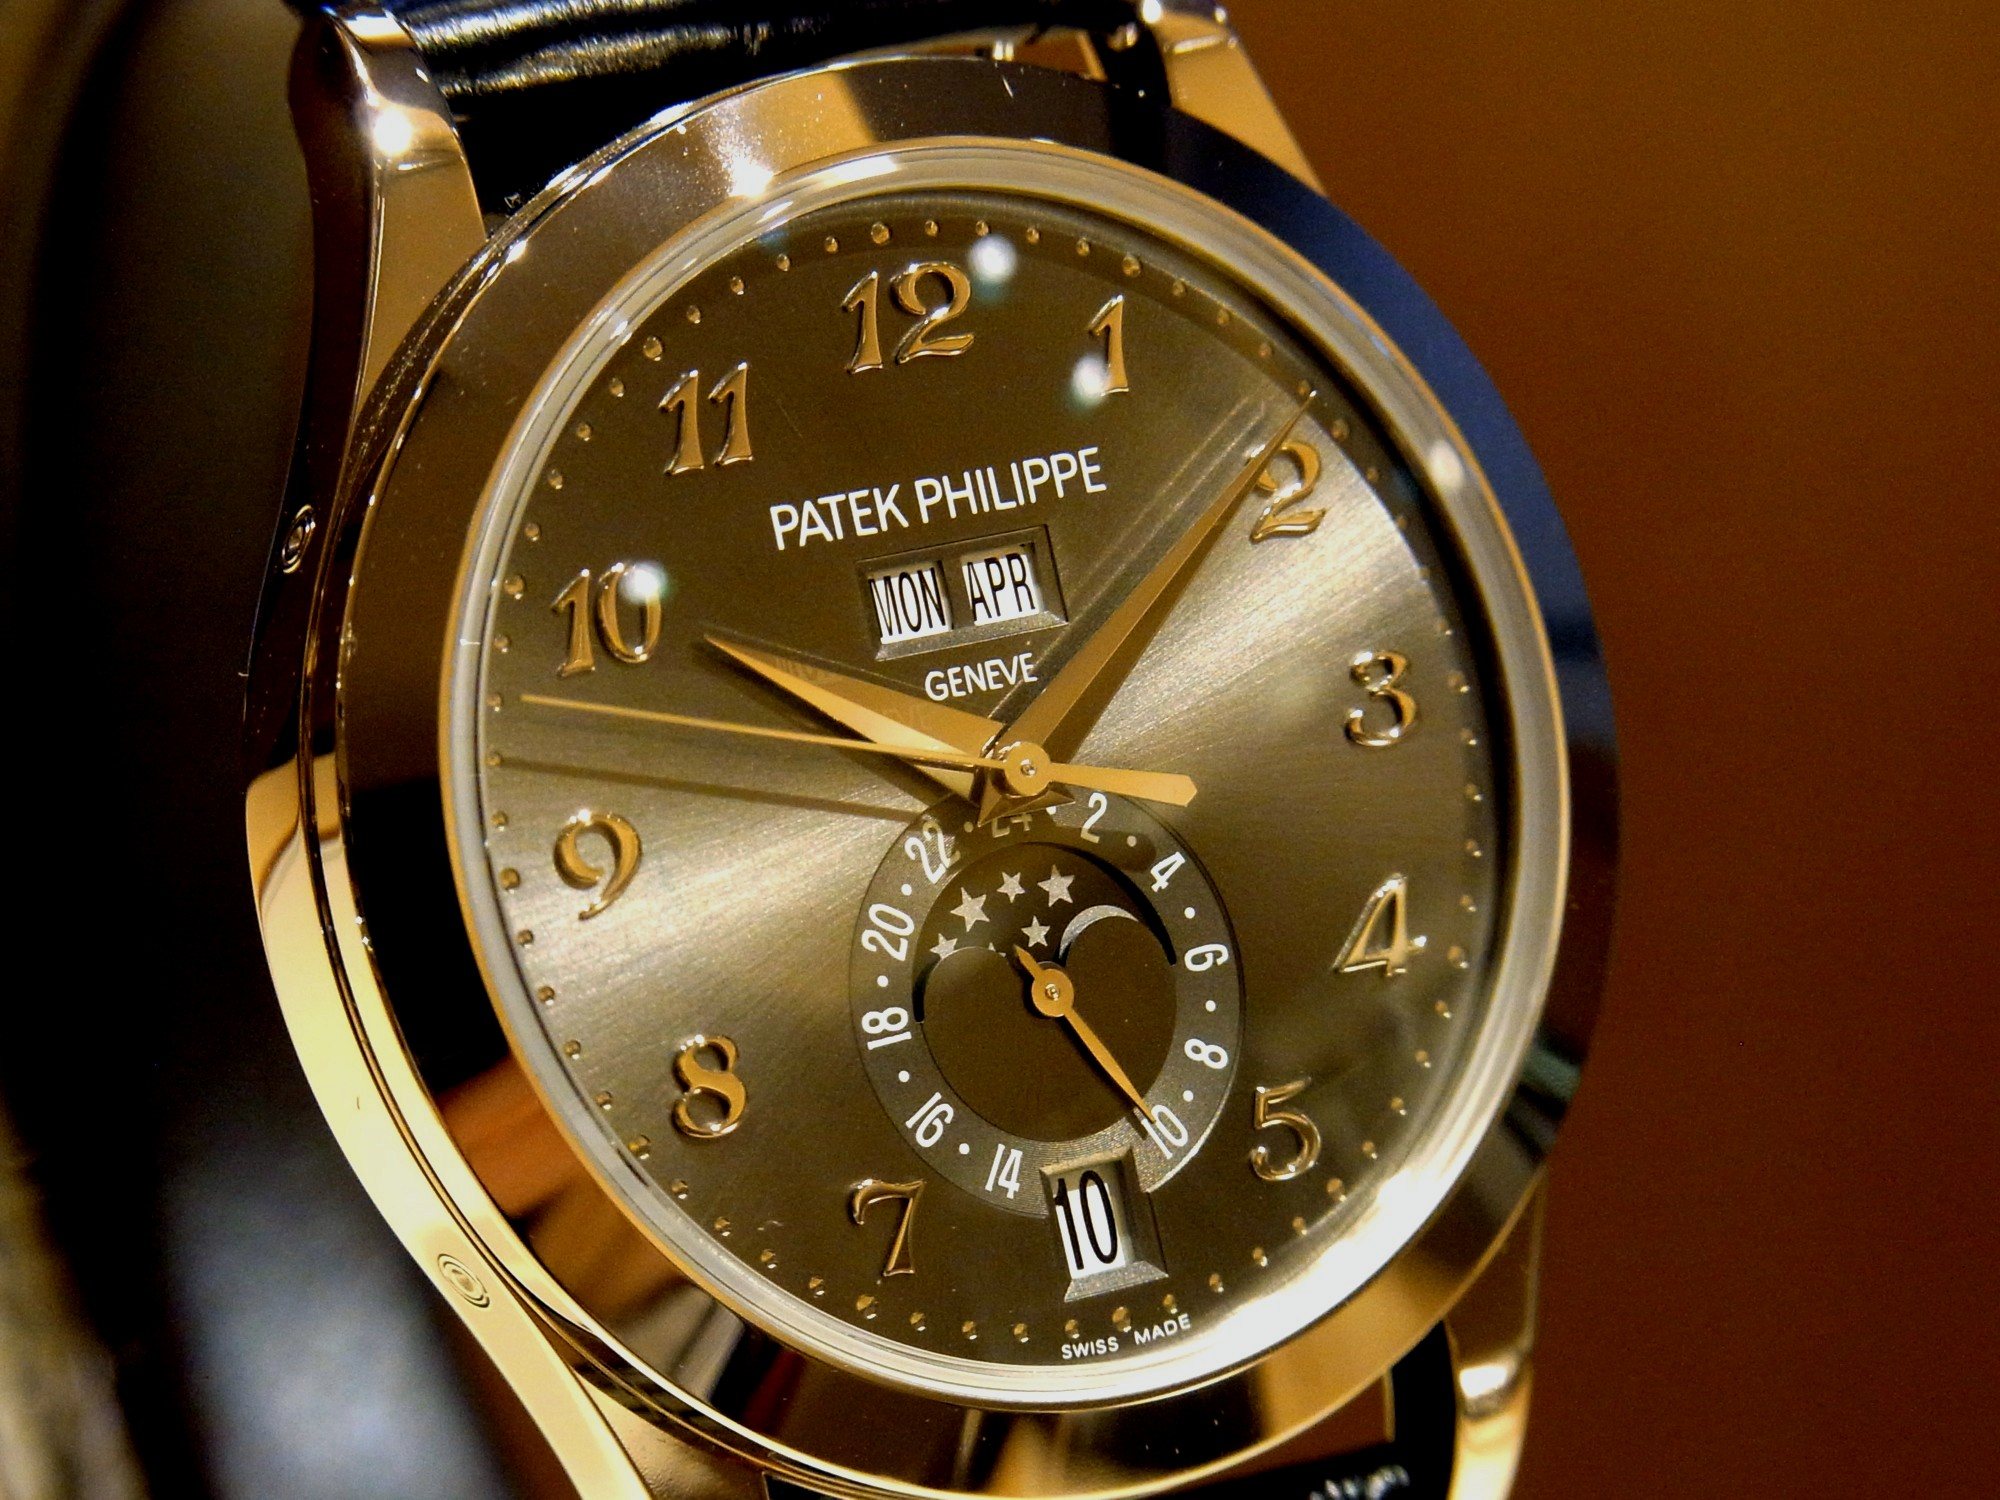 competitive price 0eab6 d9076 Patek Philippe Floorブログ | パテック フィリップの年次 ...